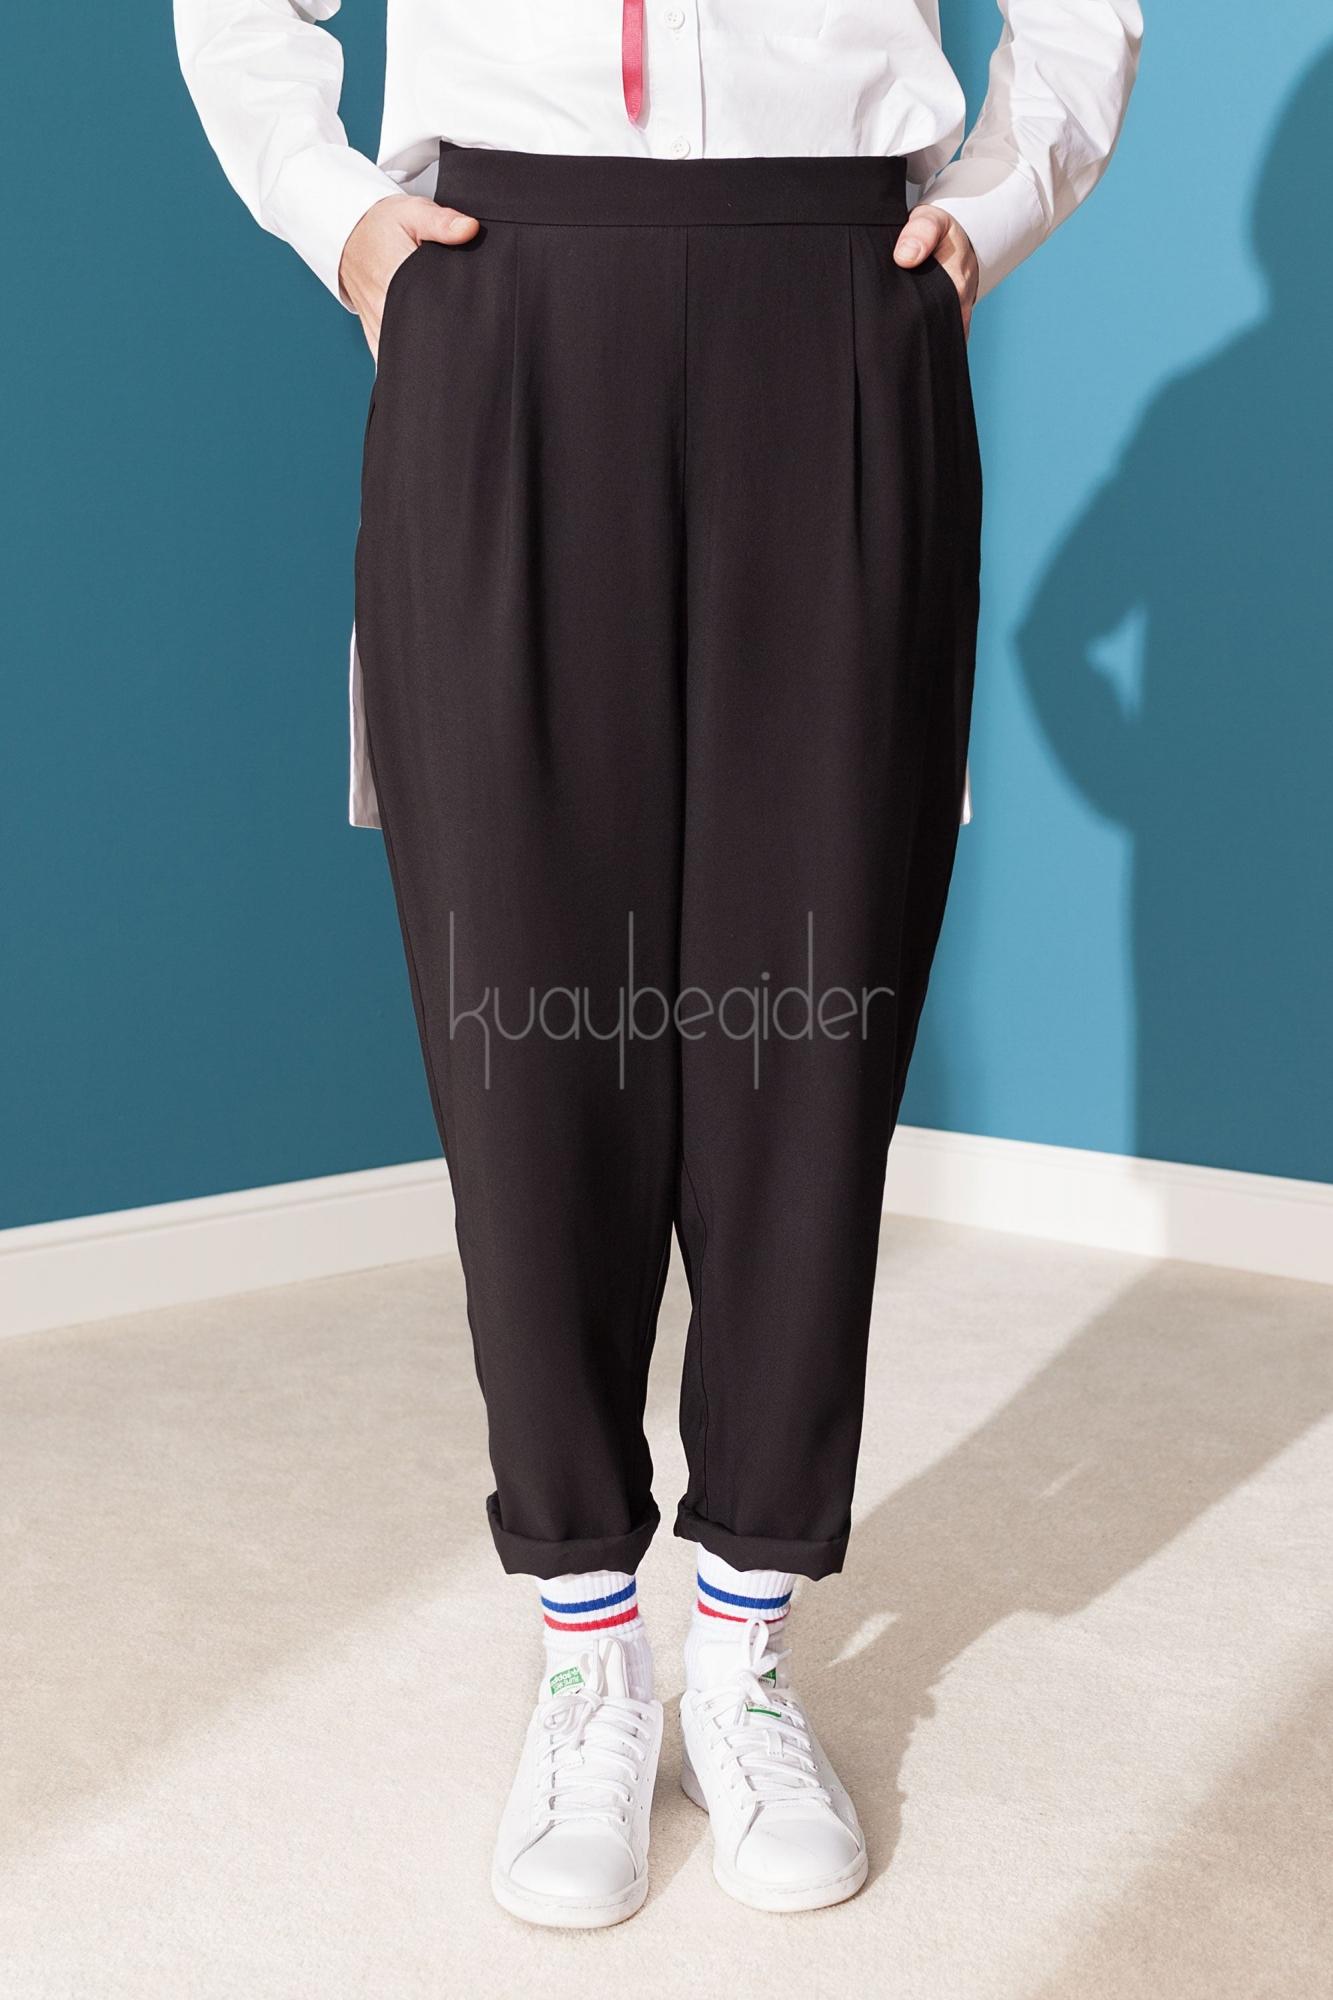 Kuaybe Gider - Siyah Paix Pantolon